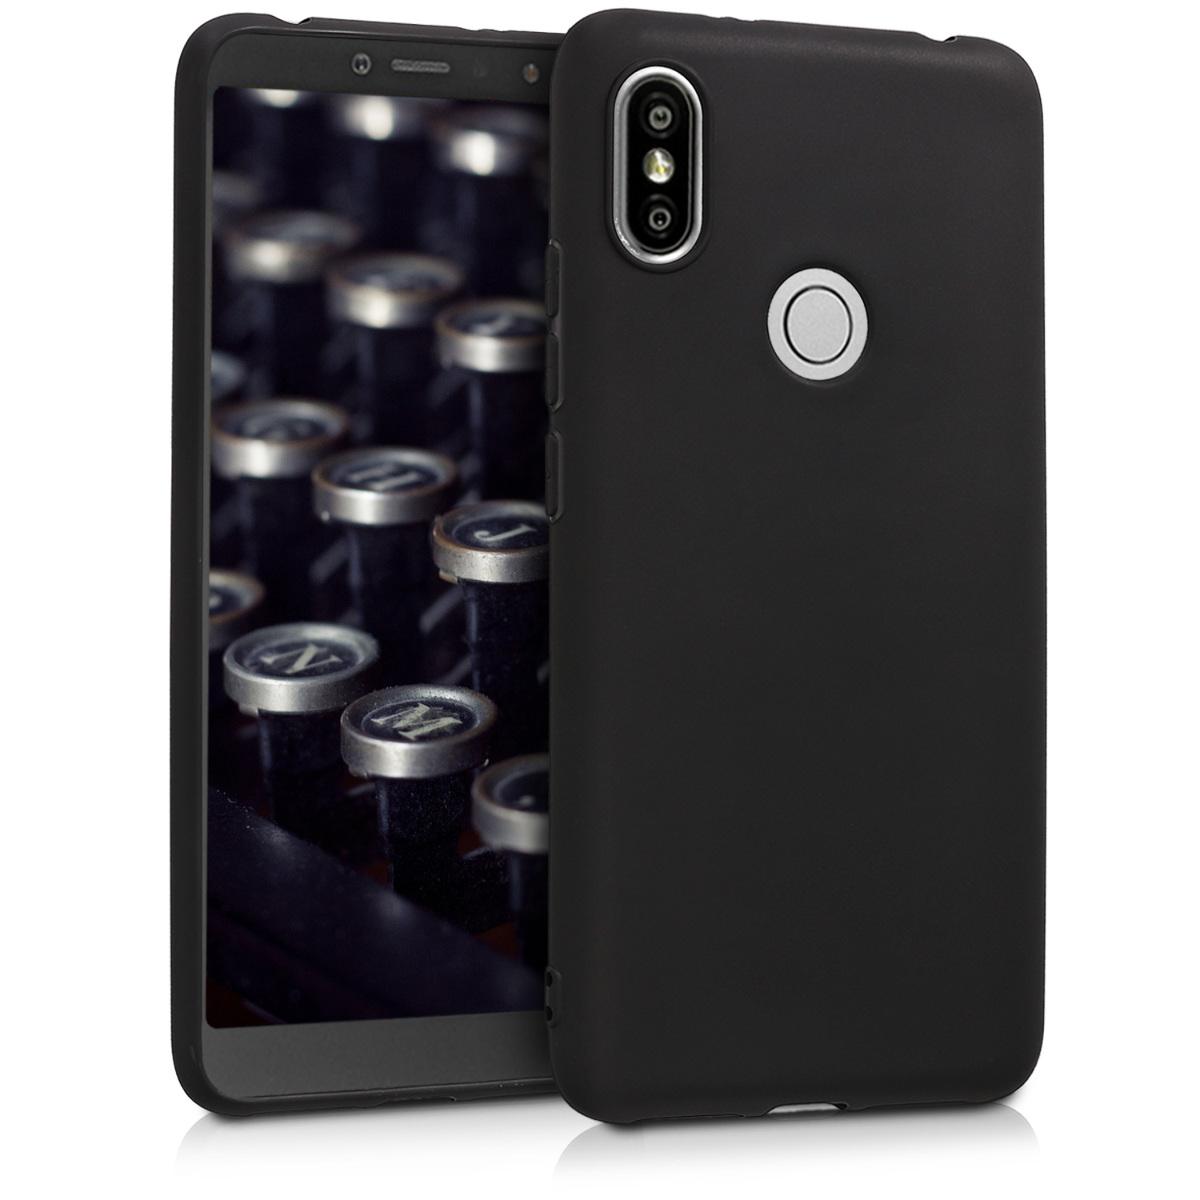 KW Θήκη Σιλικόνης Xiaomi Redmi S2 - Black Matte (45589.47)